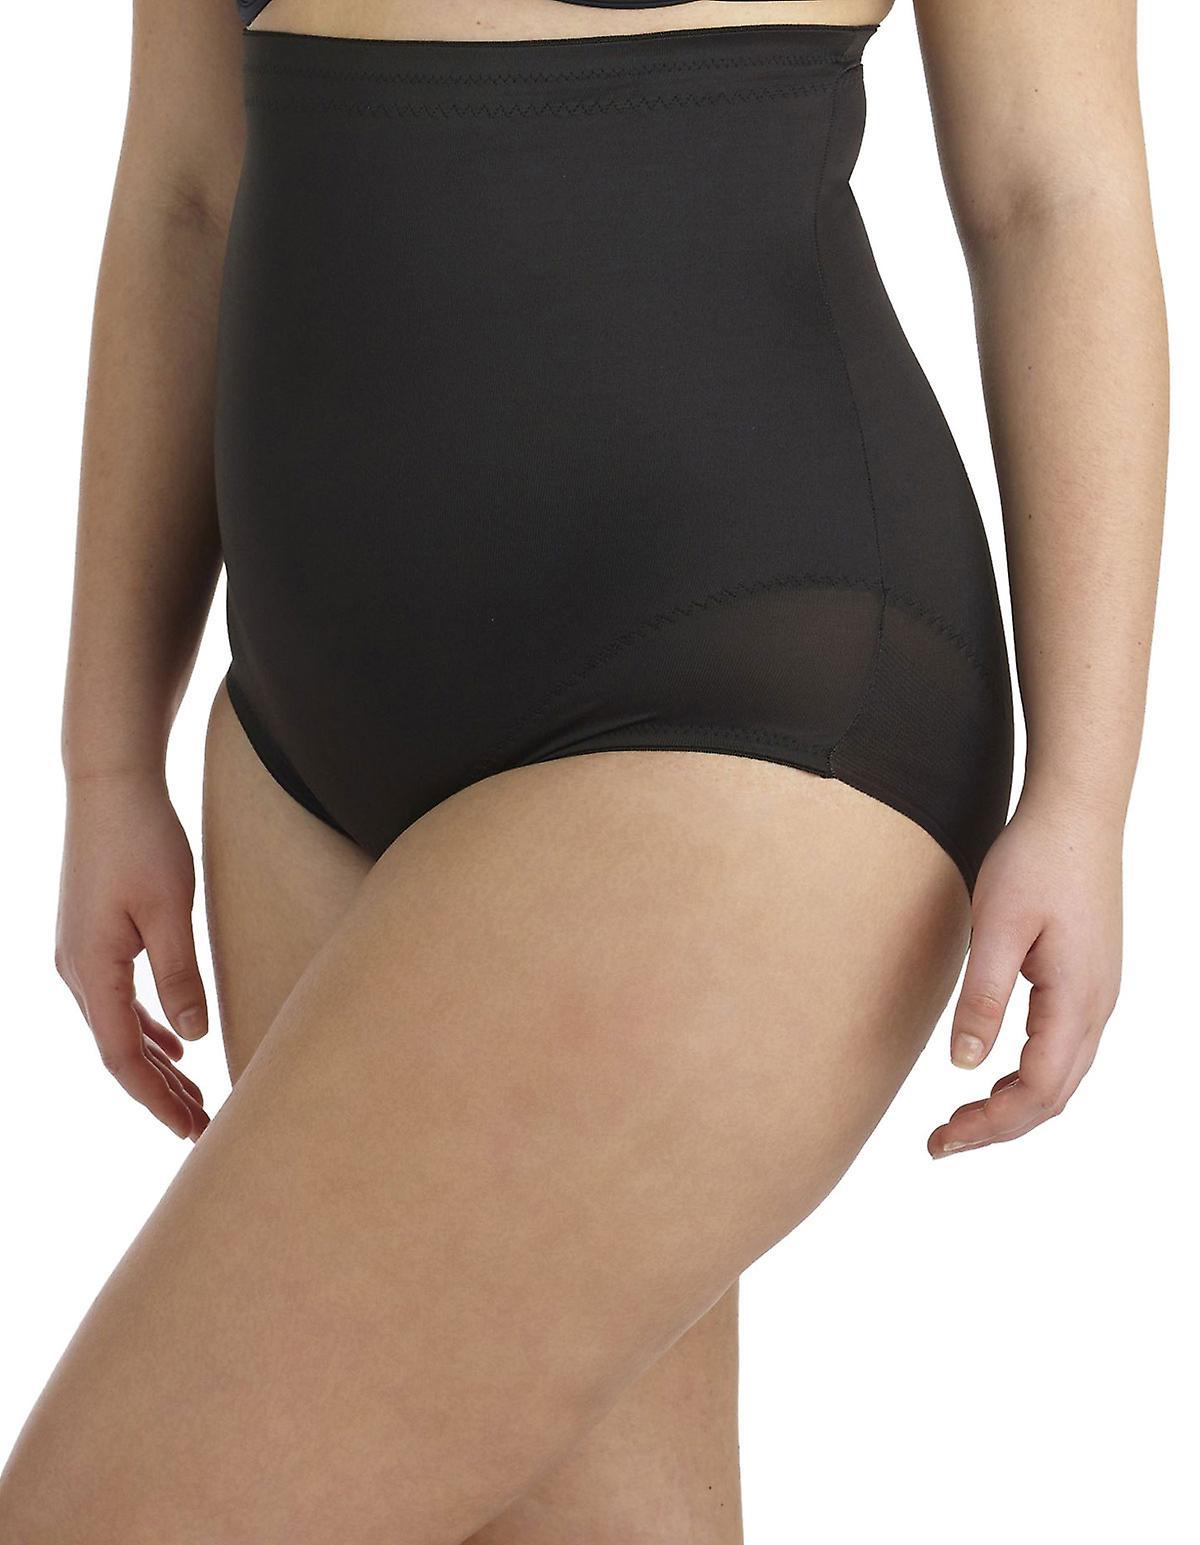 946a7c89ddc Miraclesuit Shapewear 2935 Women s Flexible Fit Plus High Waist Brief